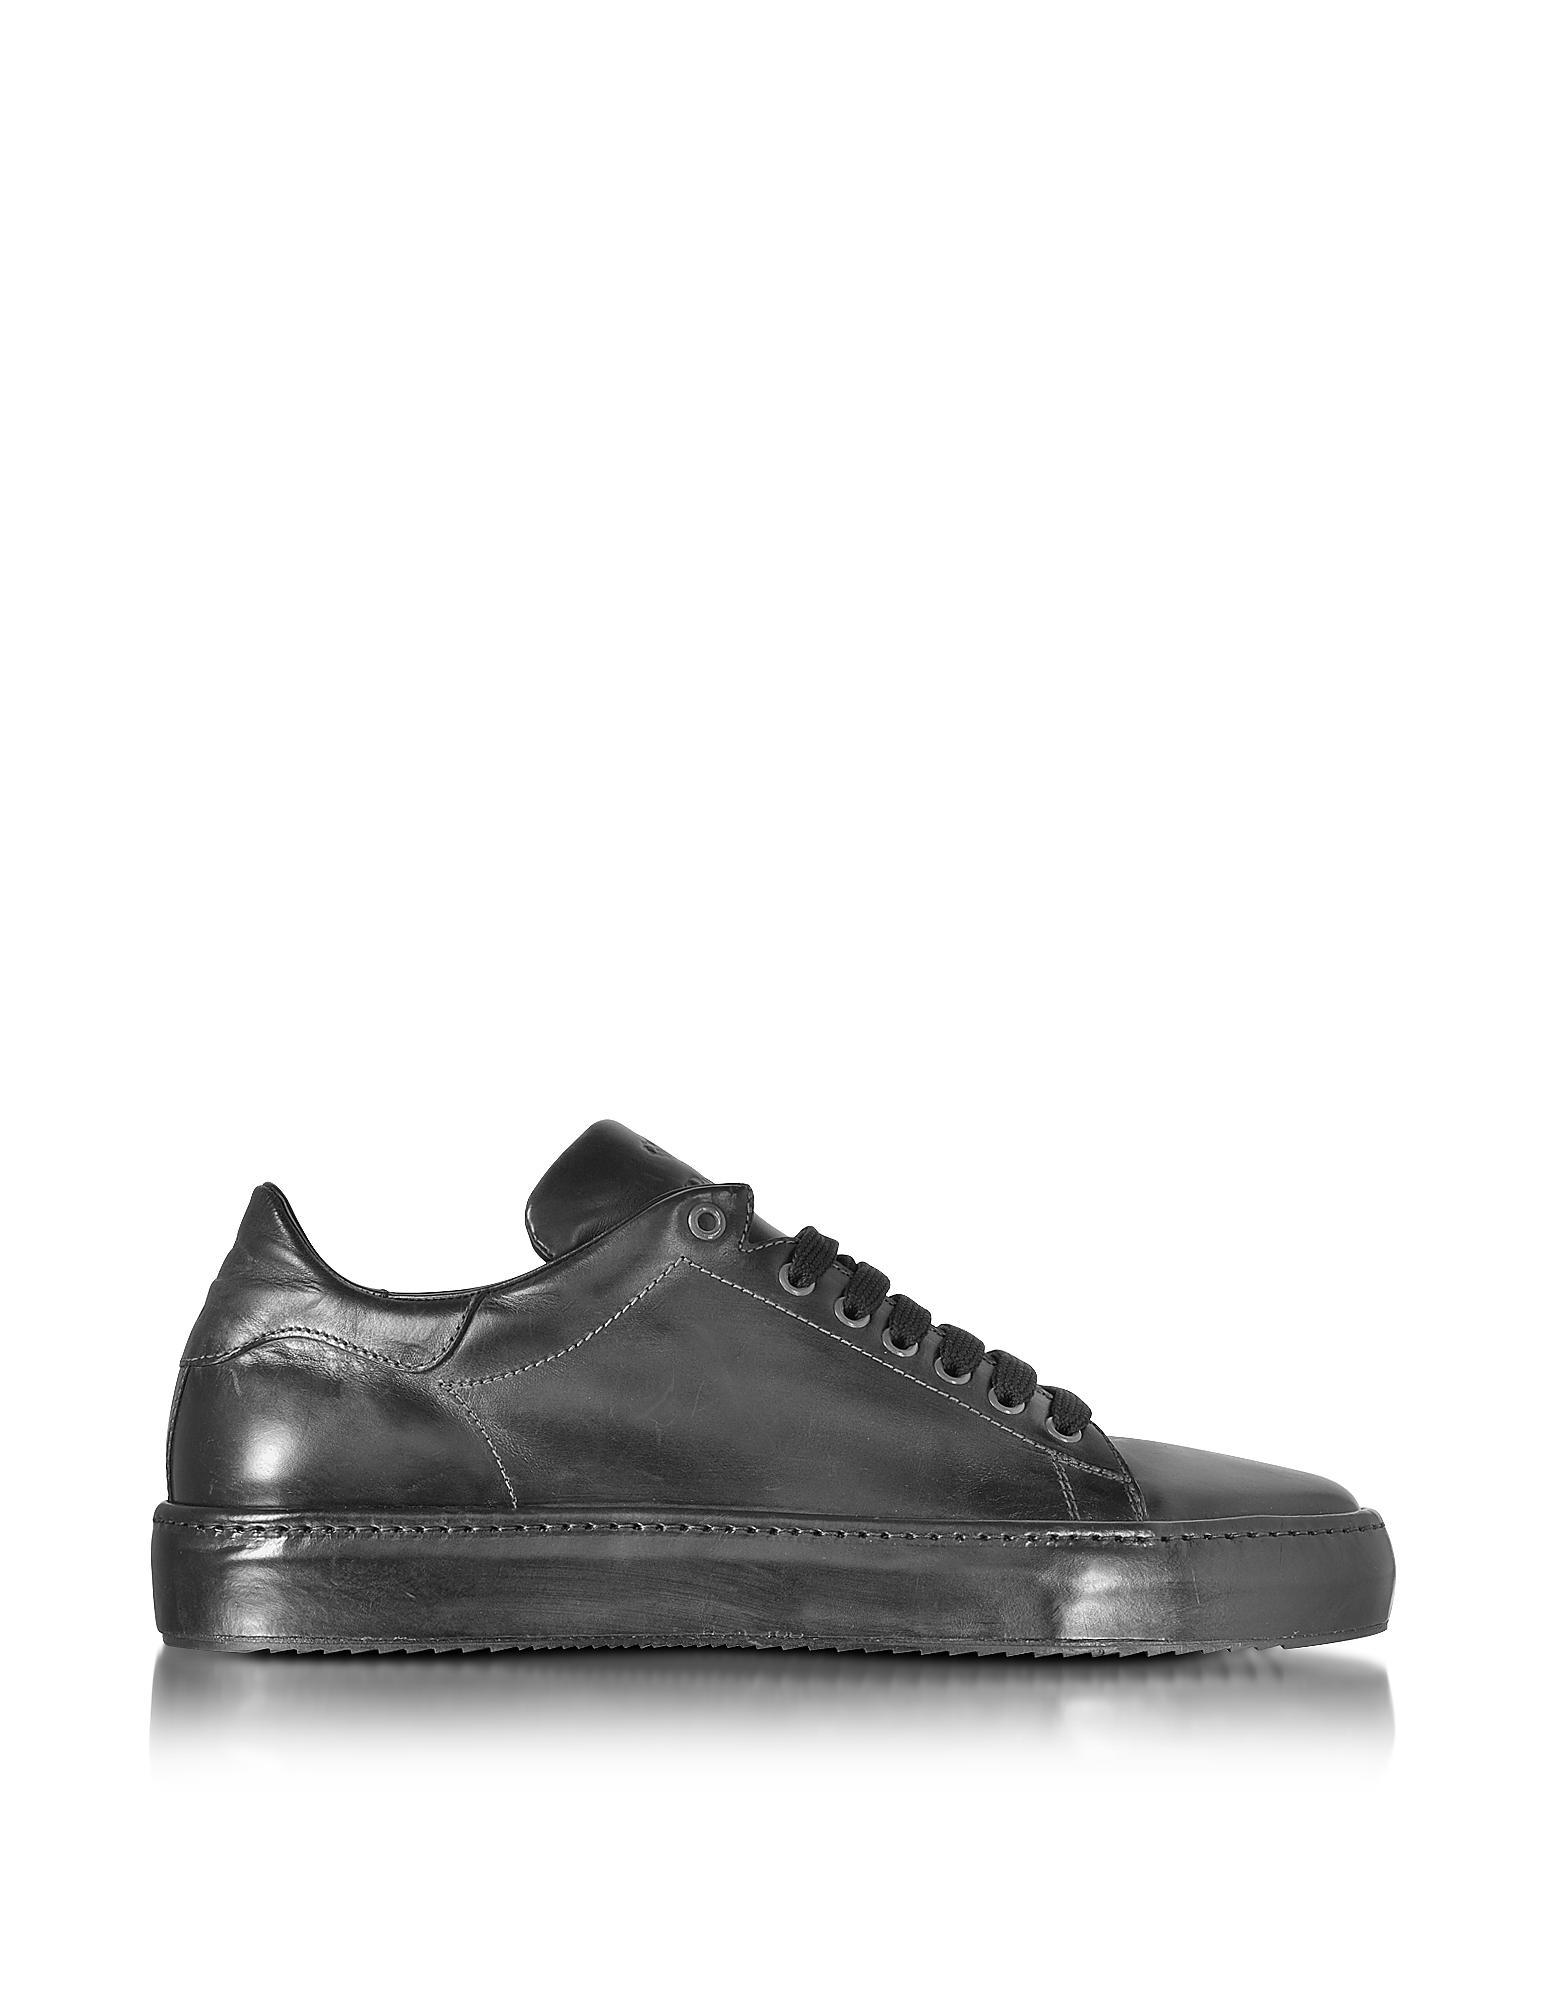 New Nike Shoes  Sneaker Folio